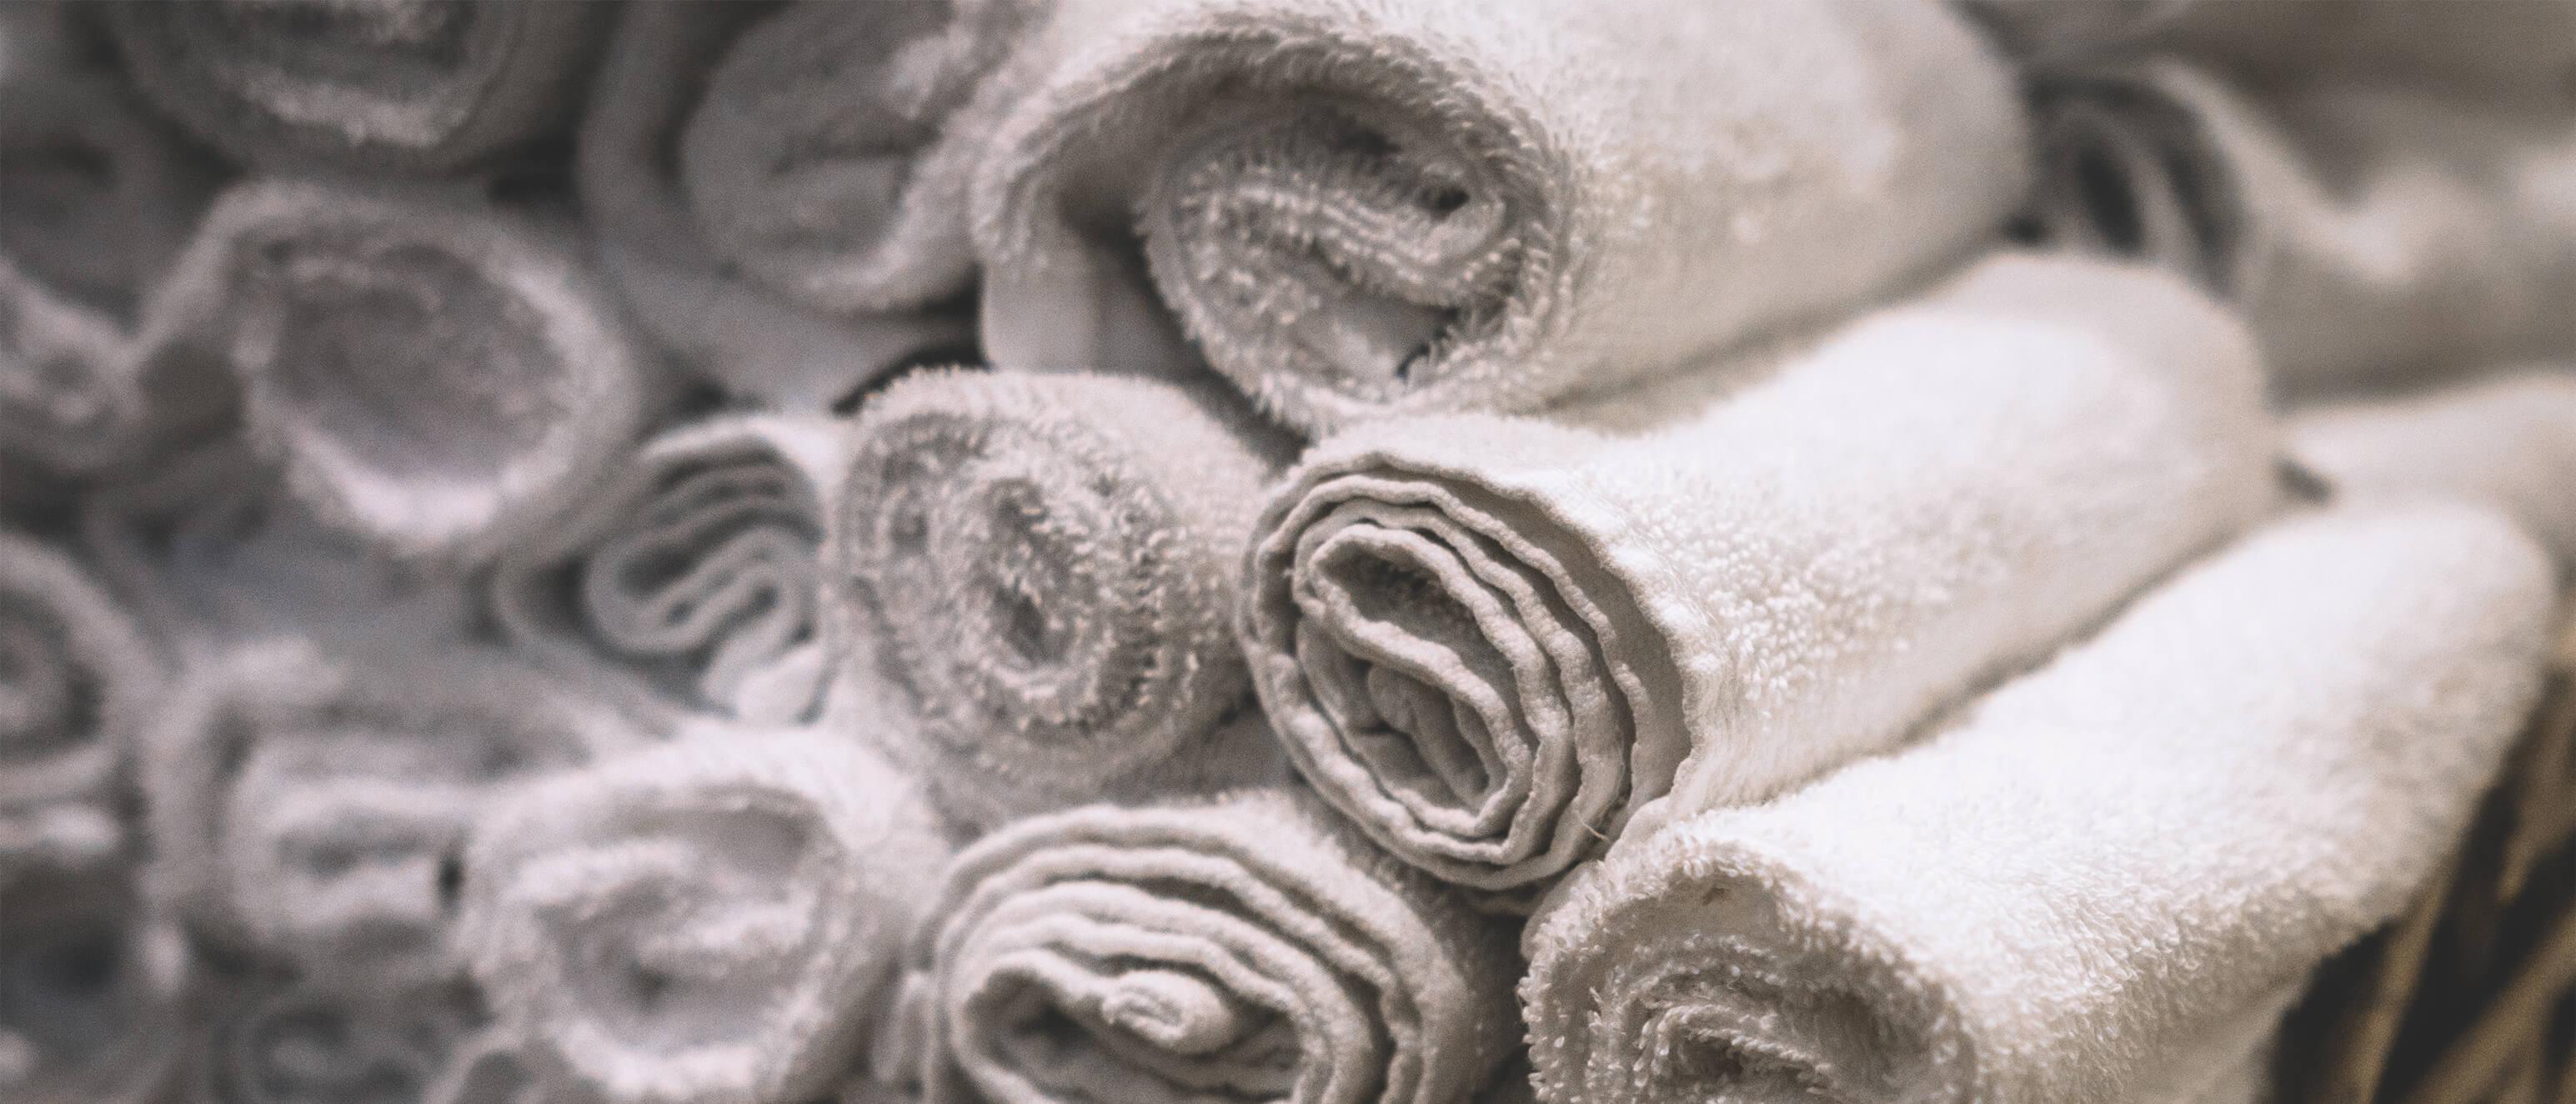 Do Towel Reuse Programs Save Money?